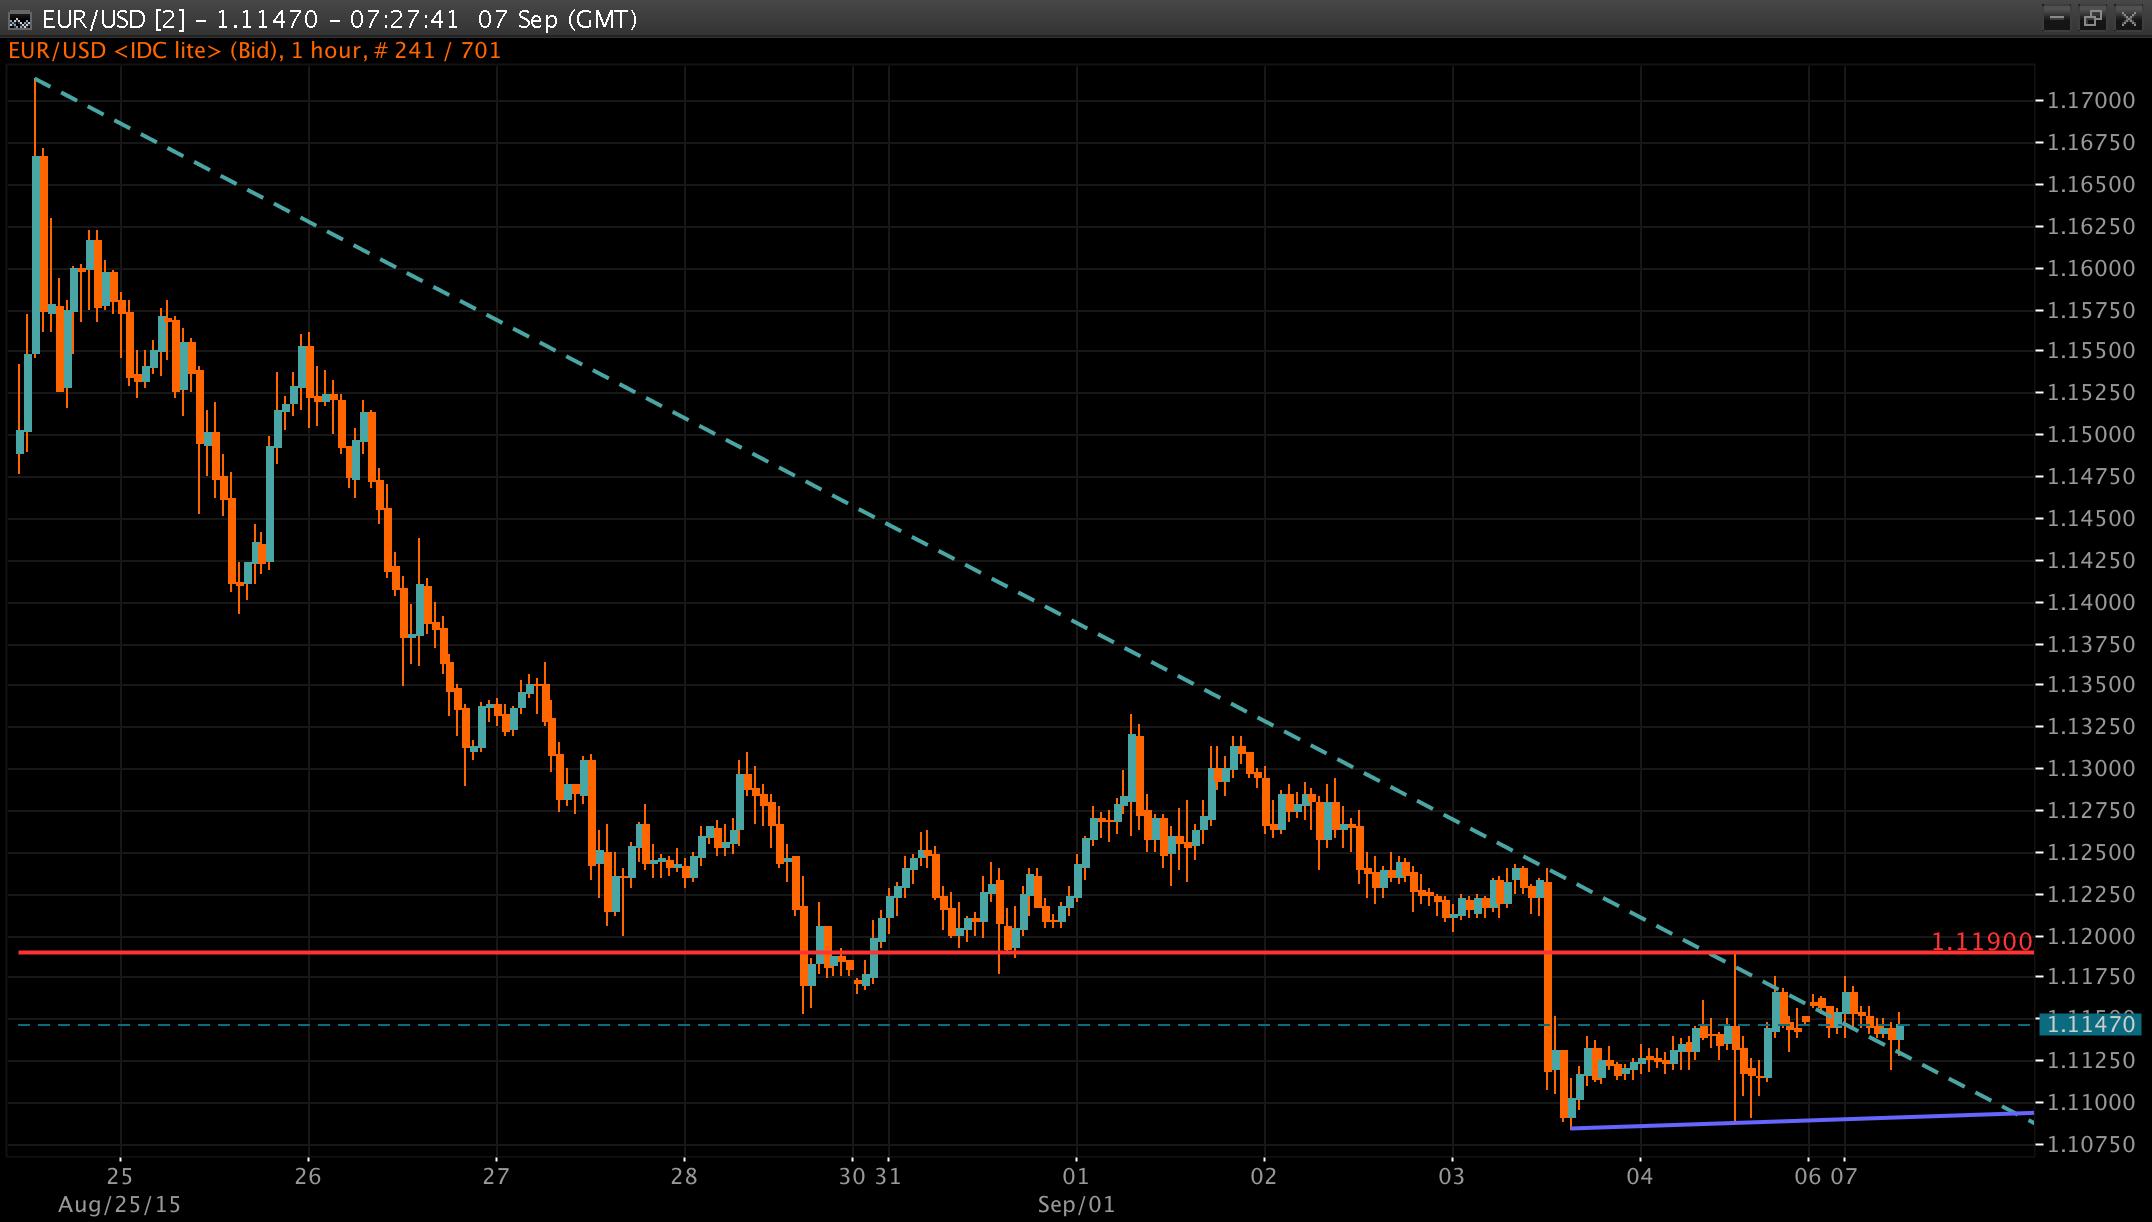 EUR/USD Chart 07/09/2015